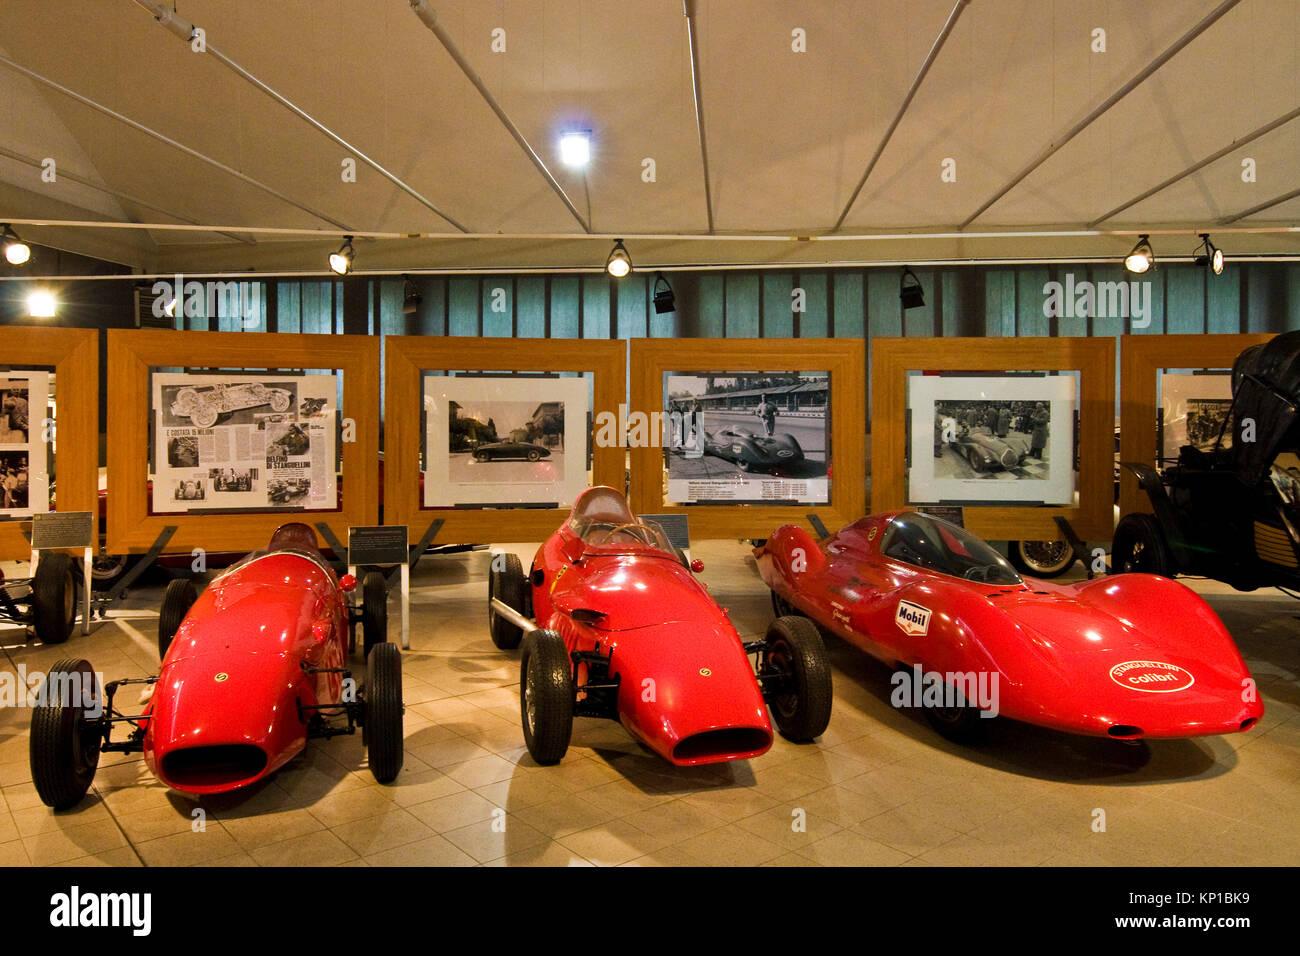 Cars Museum Museums Interior Stock Photos Amp Cars Museum